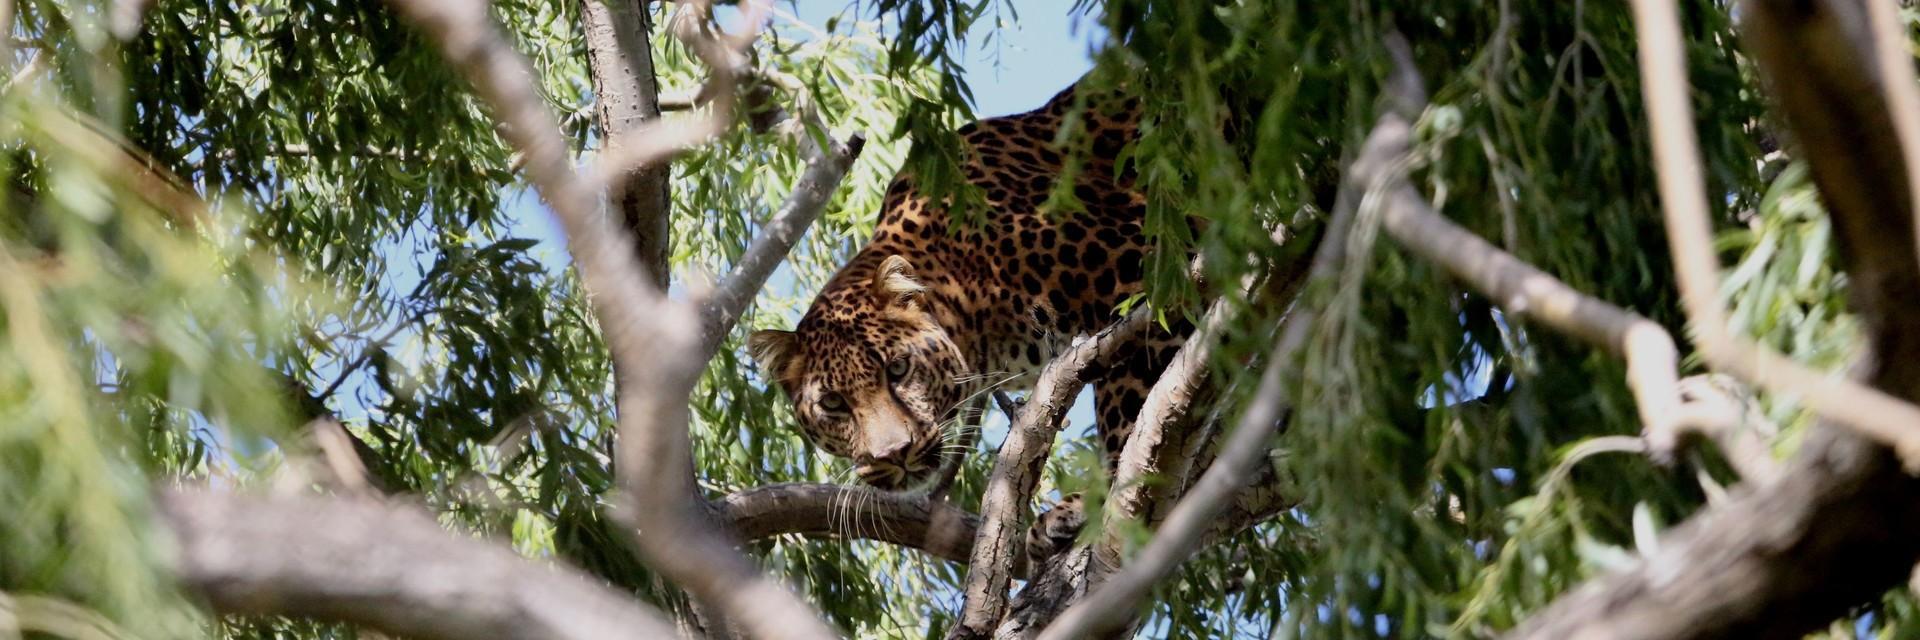 Luipaard Bakari in LIONSROCK